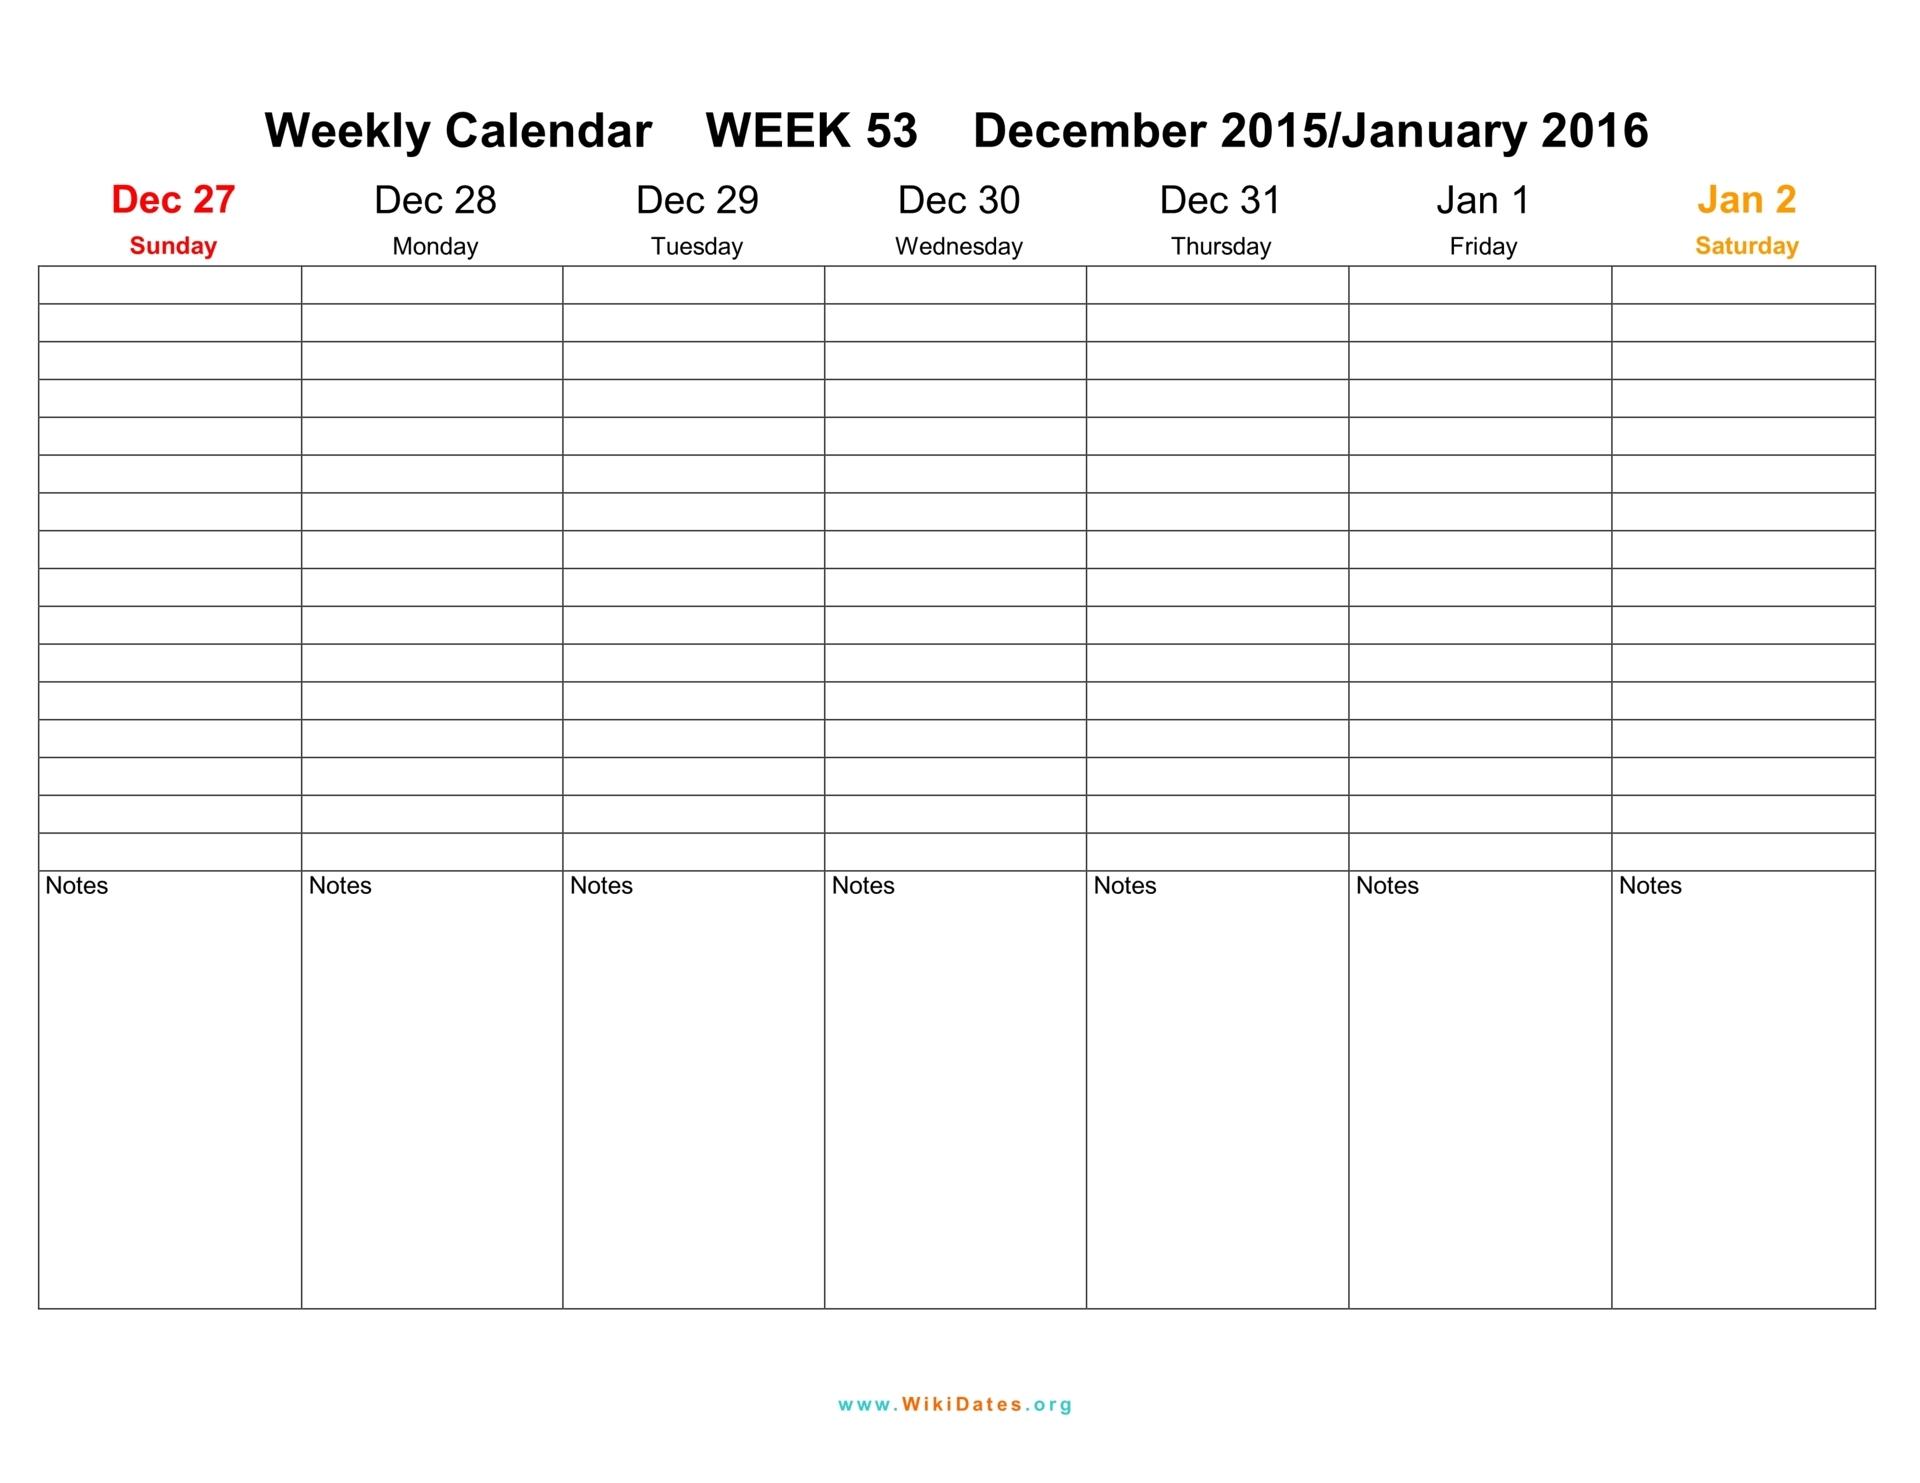 Weekly Calendar 2016 2017 2018 | WikiDates.org